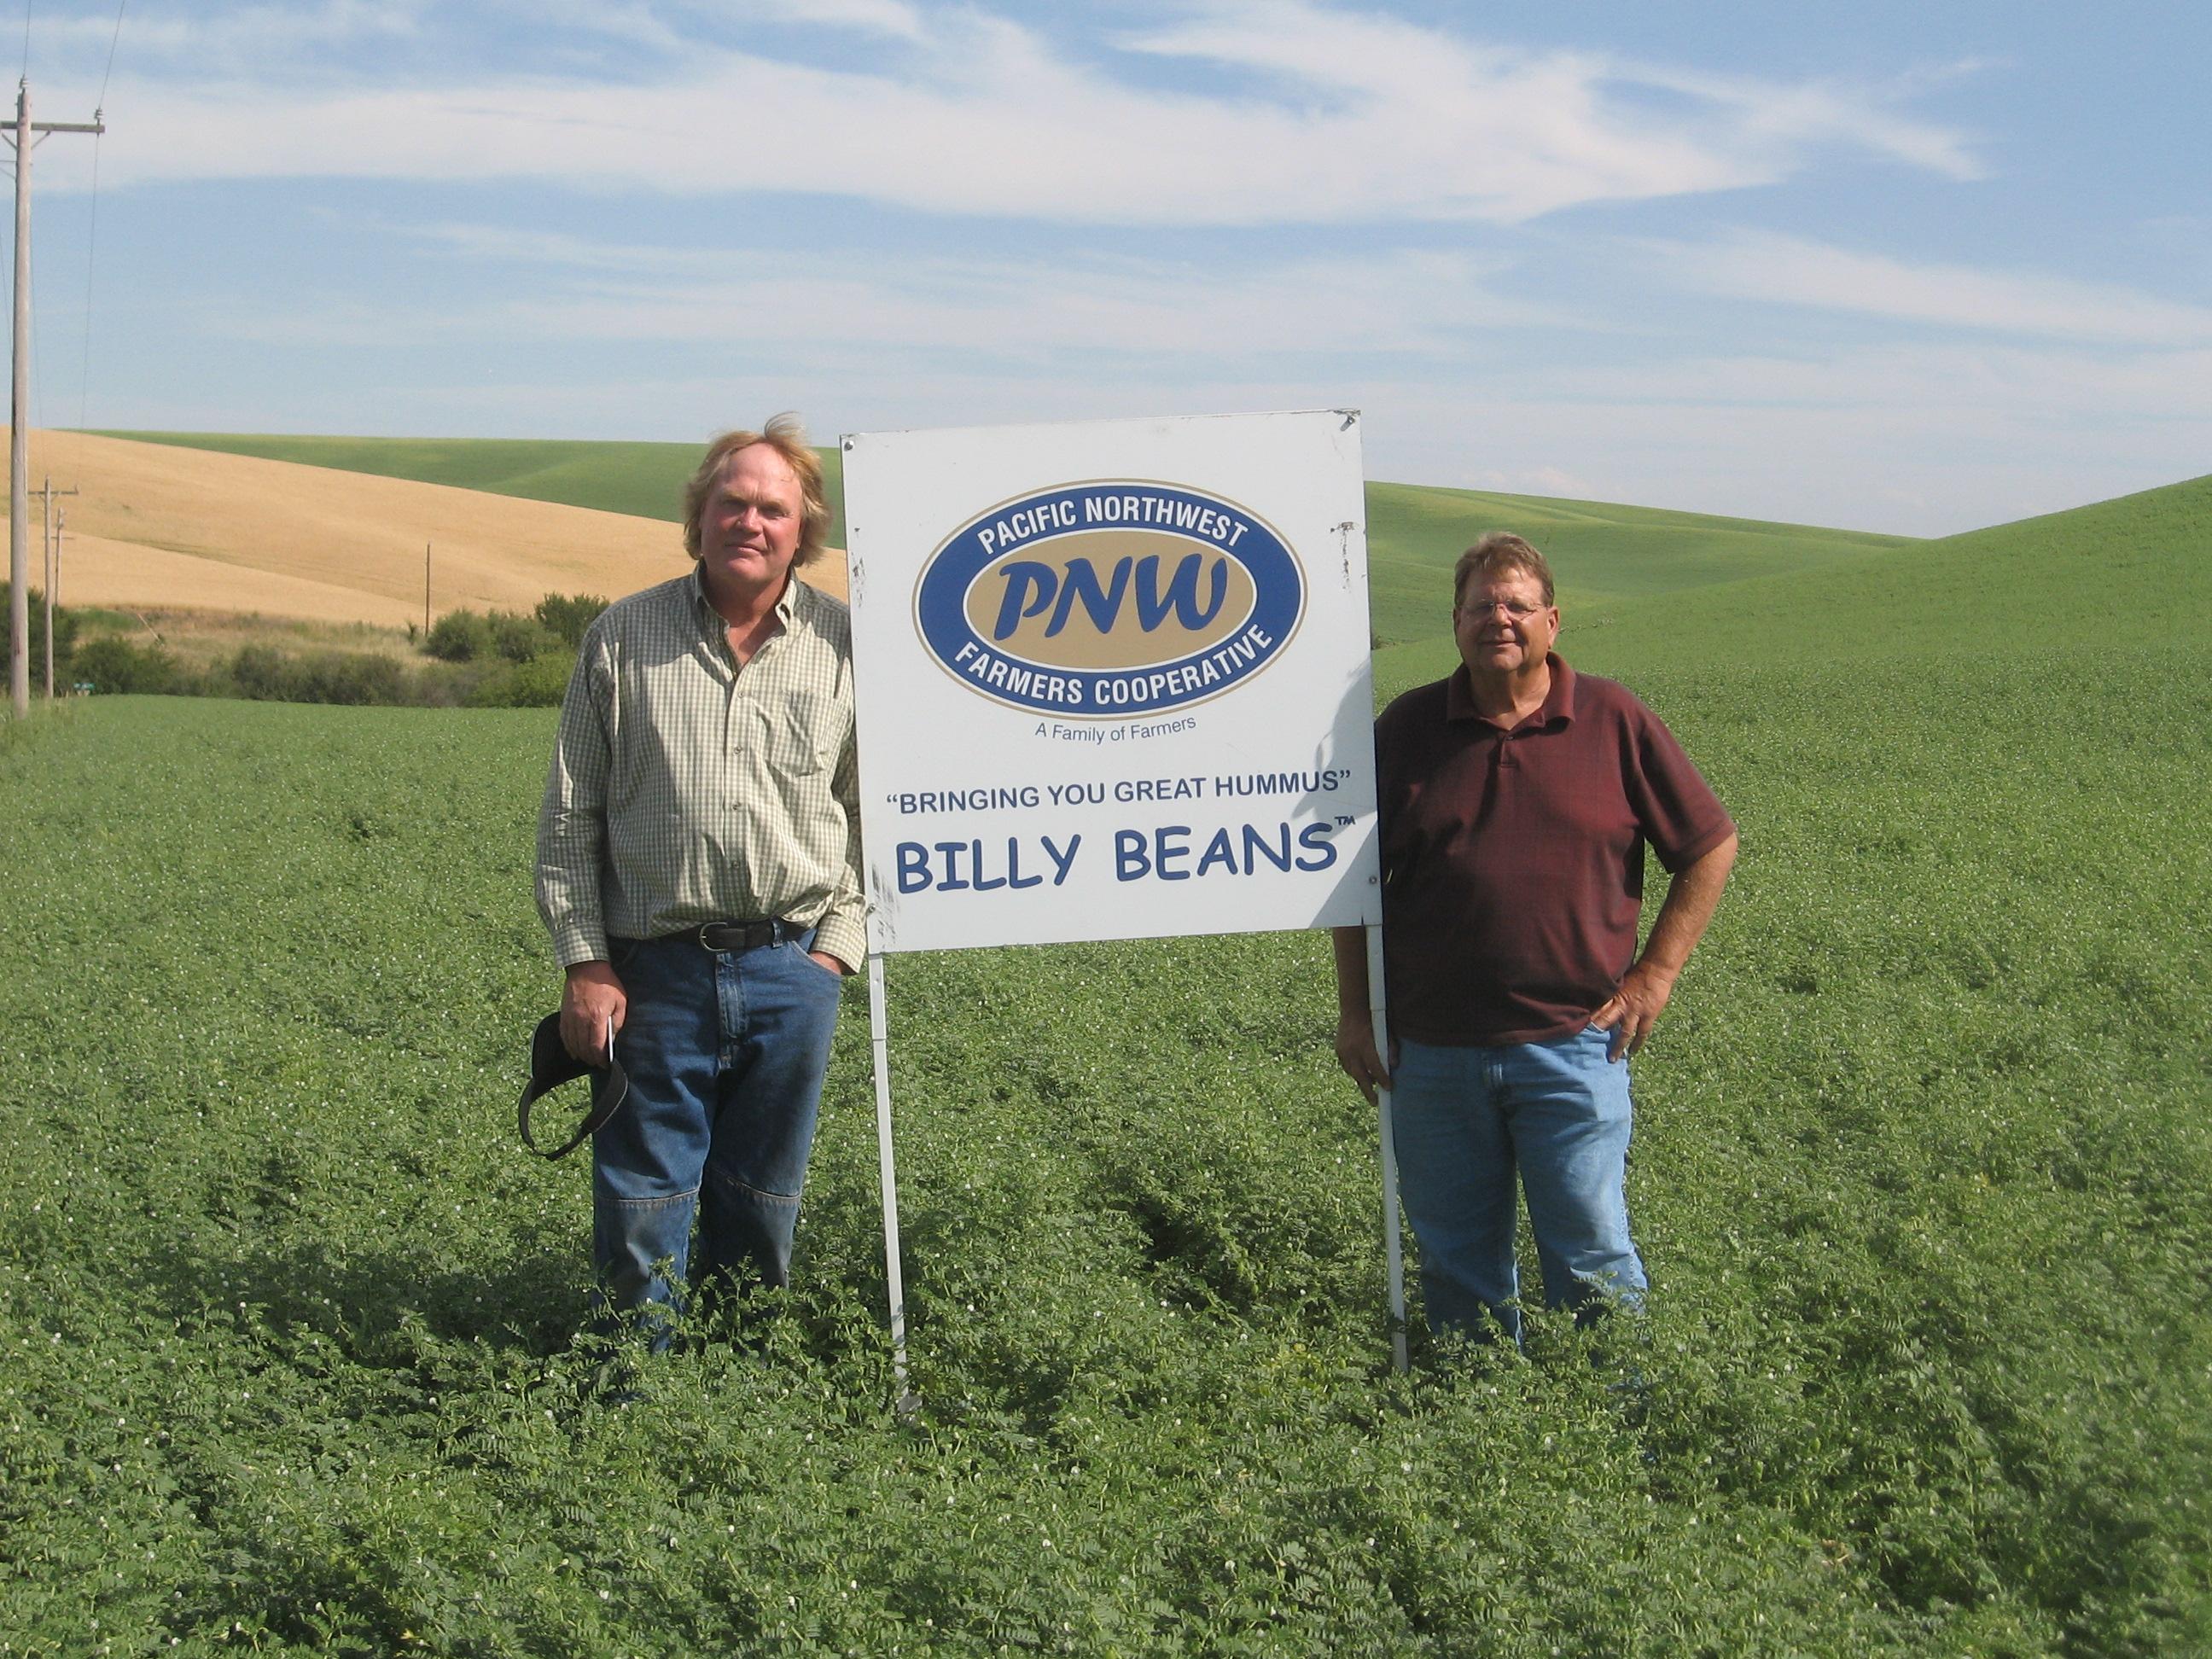 Billy Beans